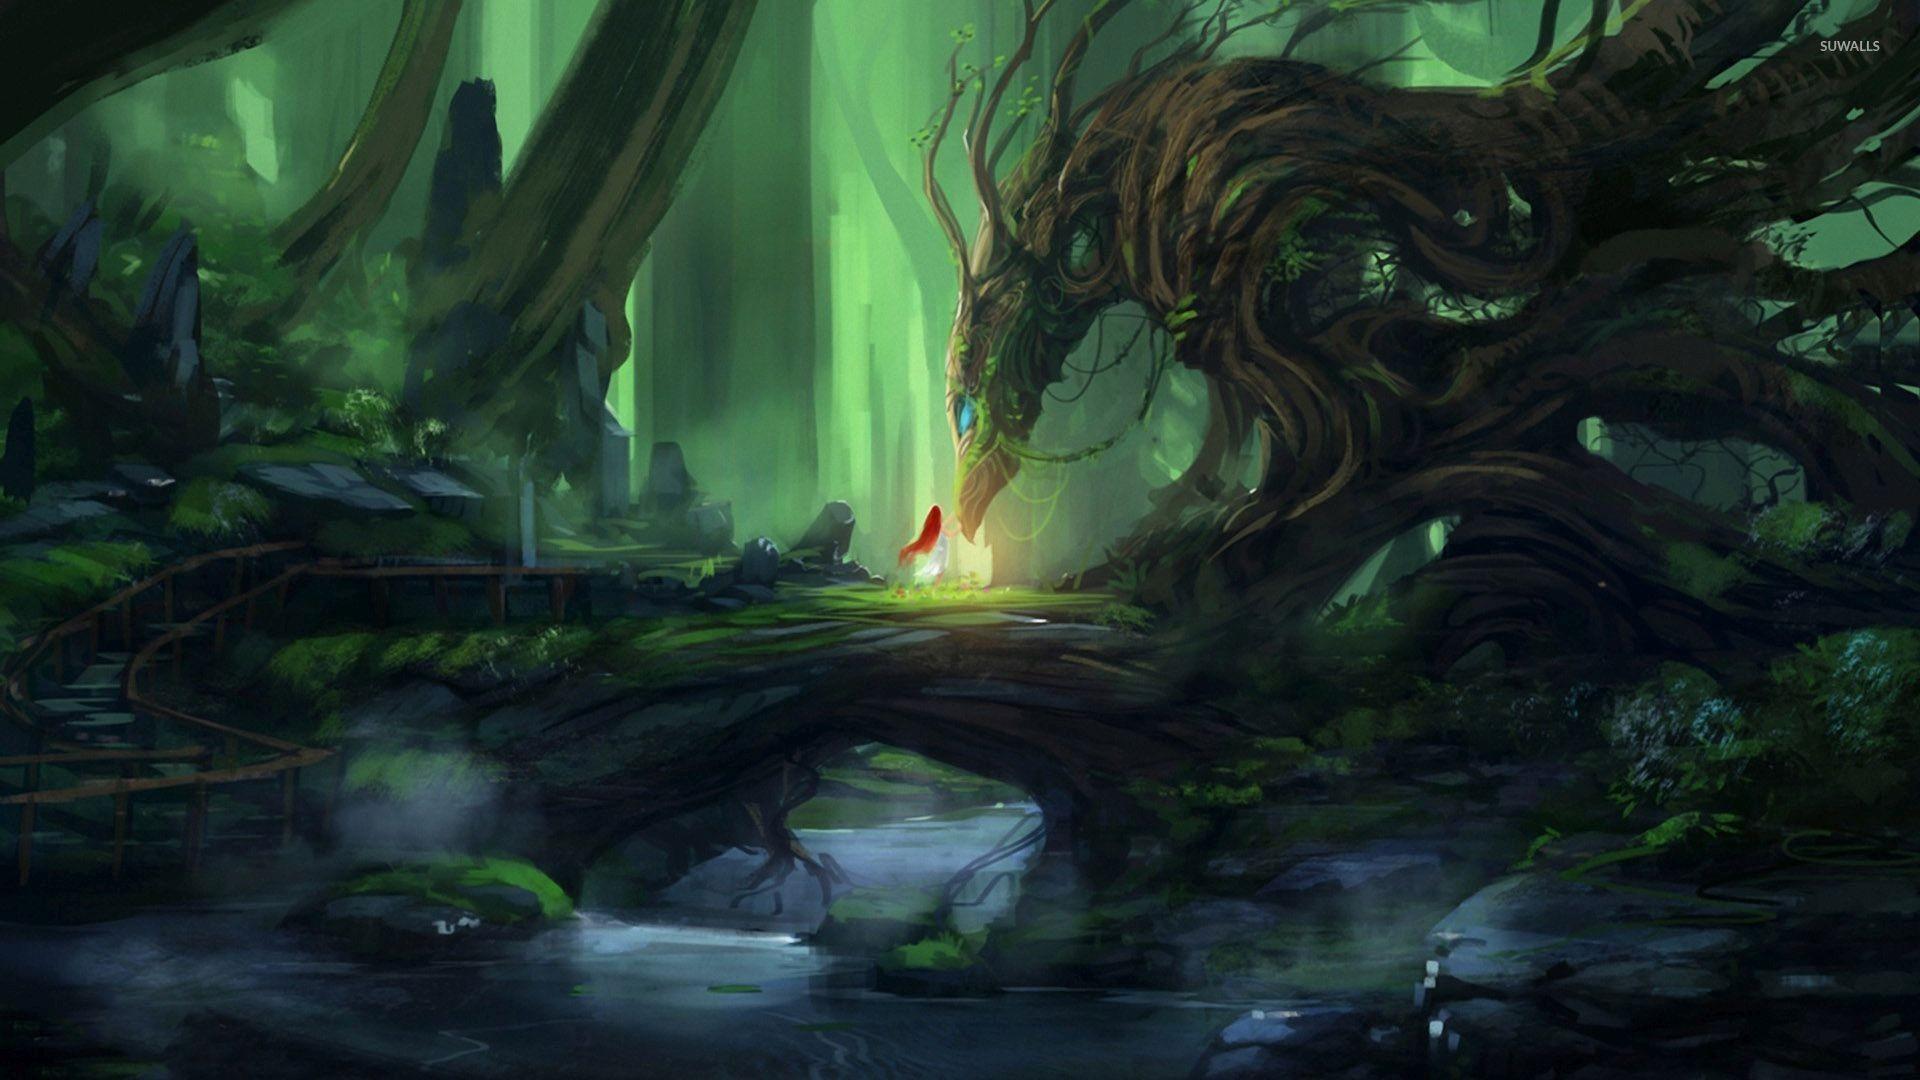 Tree dragon wallpaper